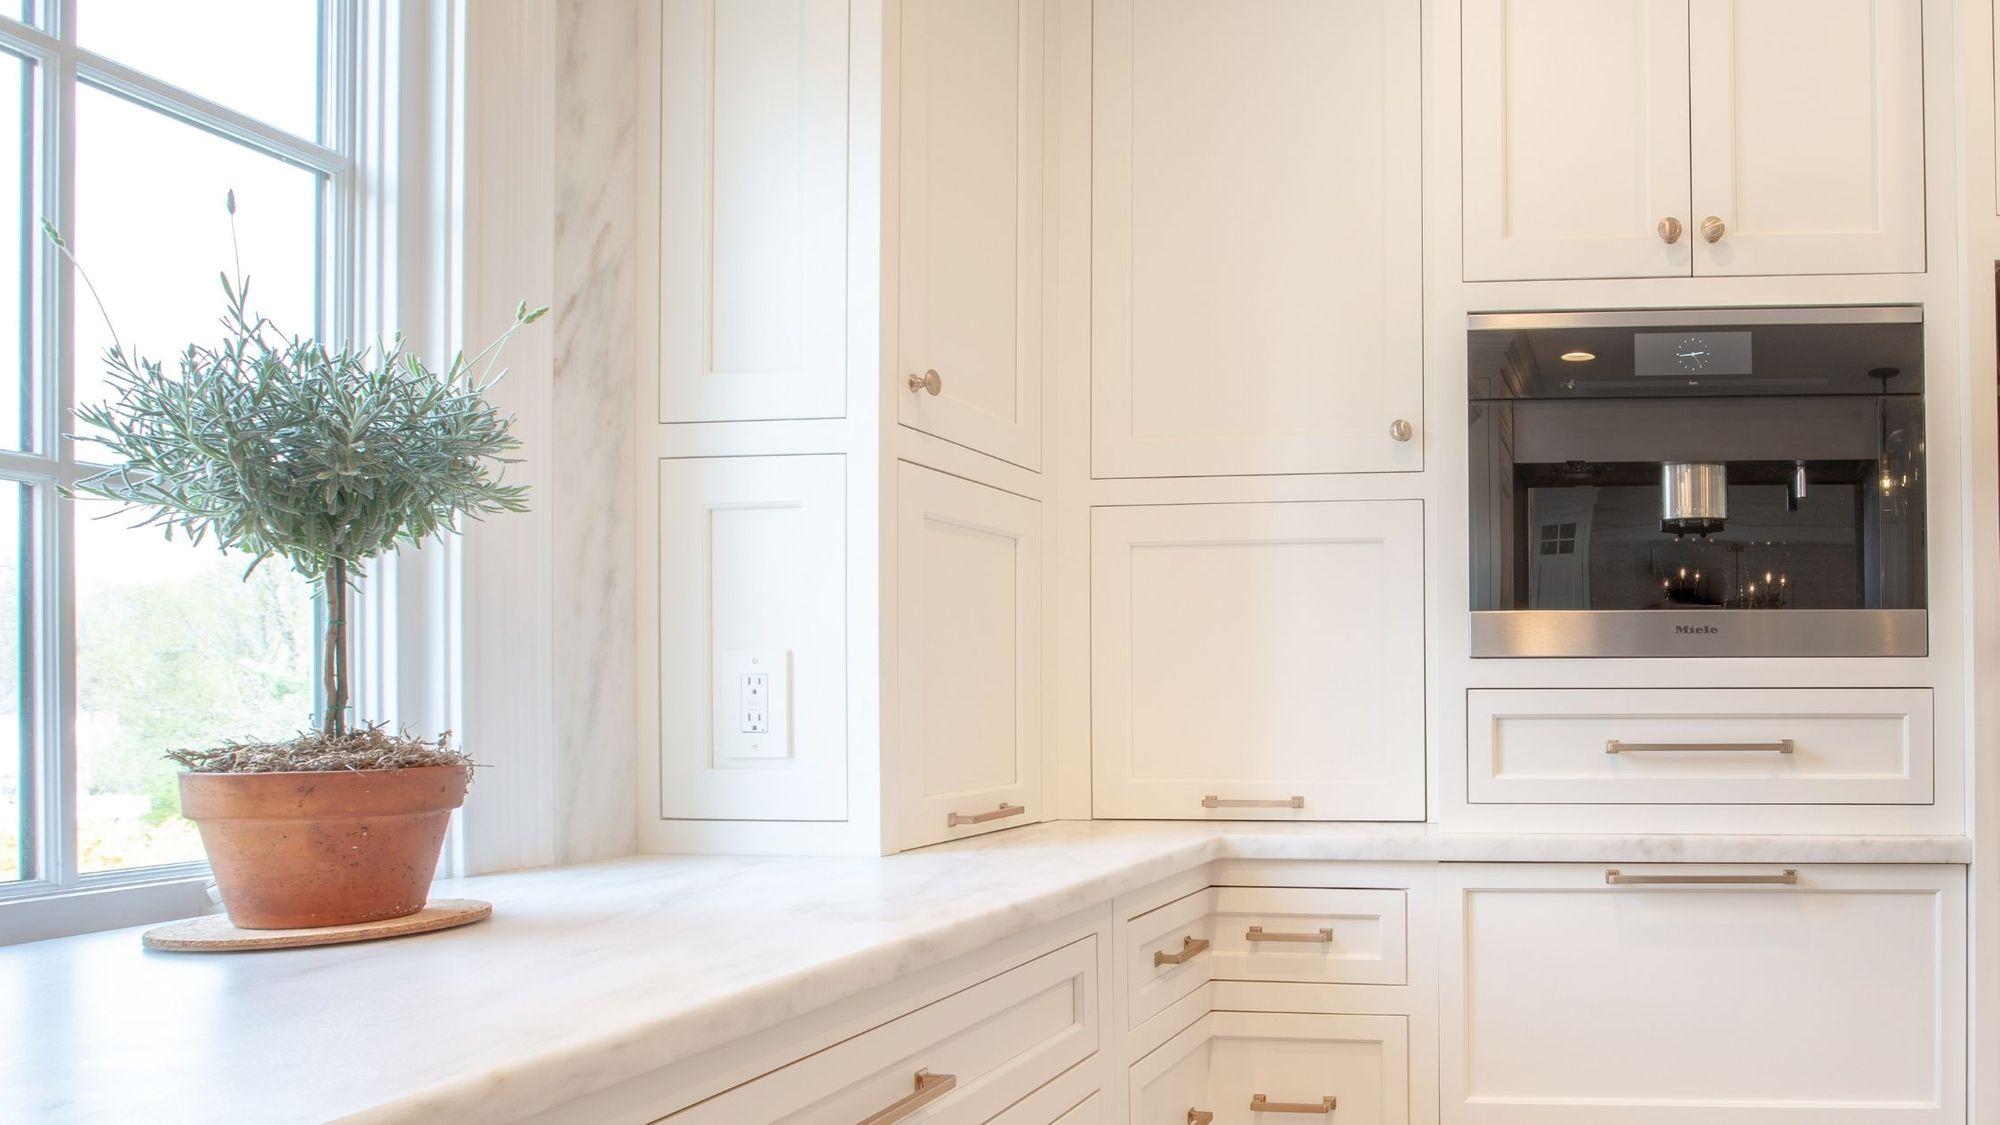 miele-built-in-coffee-maker-cva6805-in-customer-kitchen